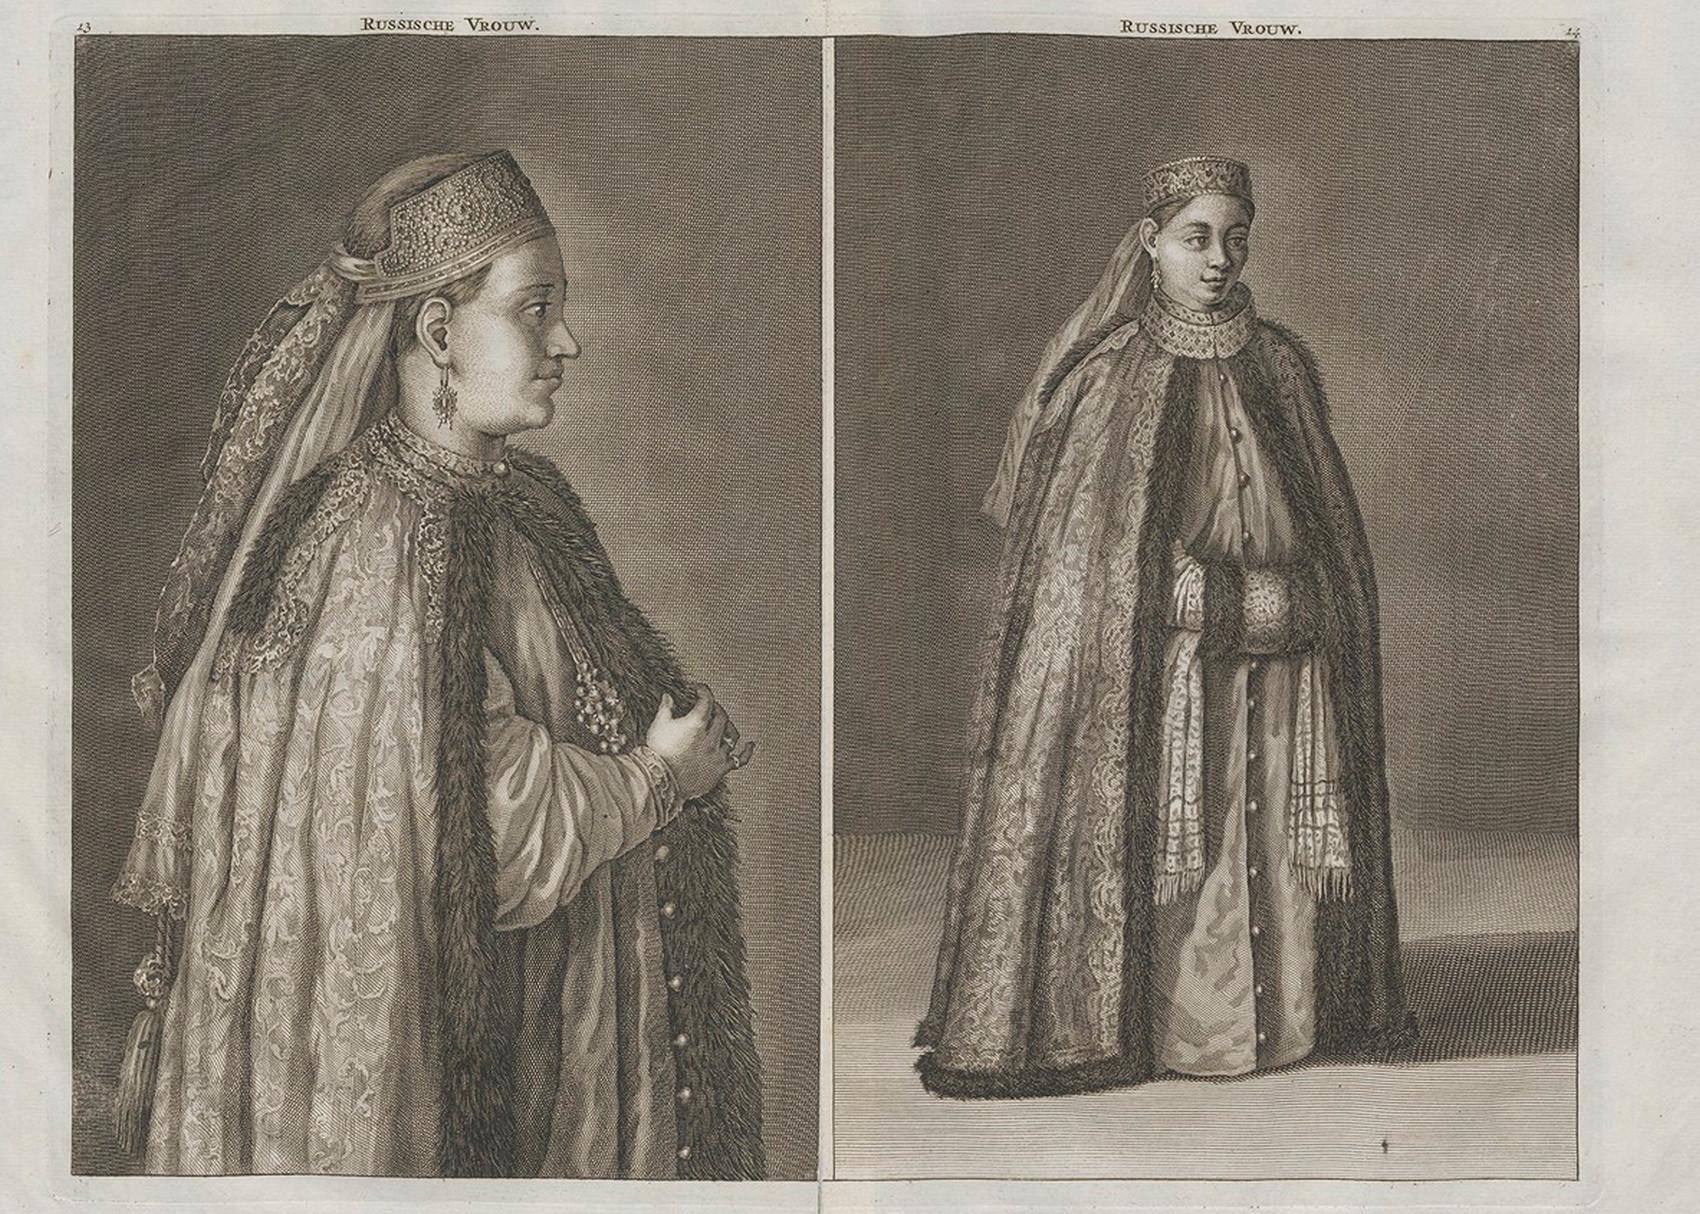 Russian woman, 1711.